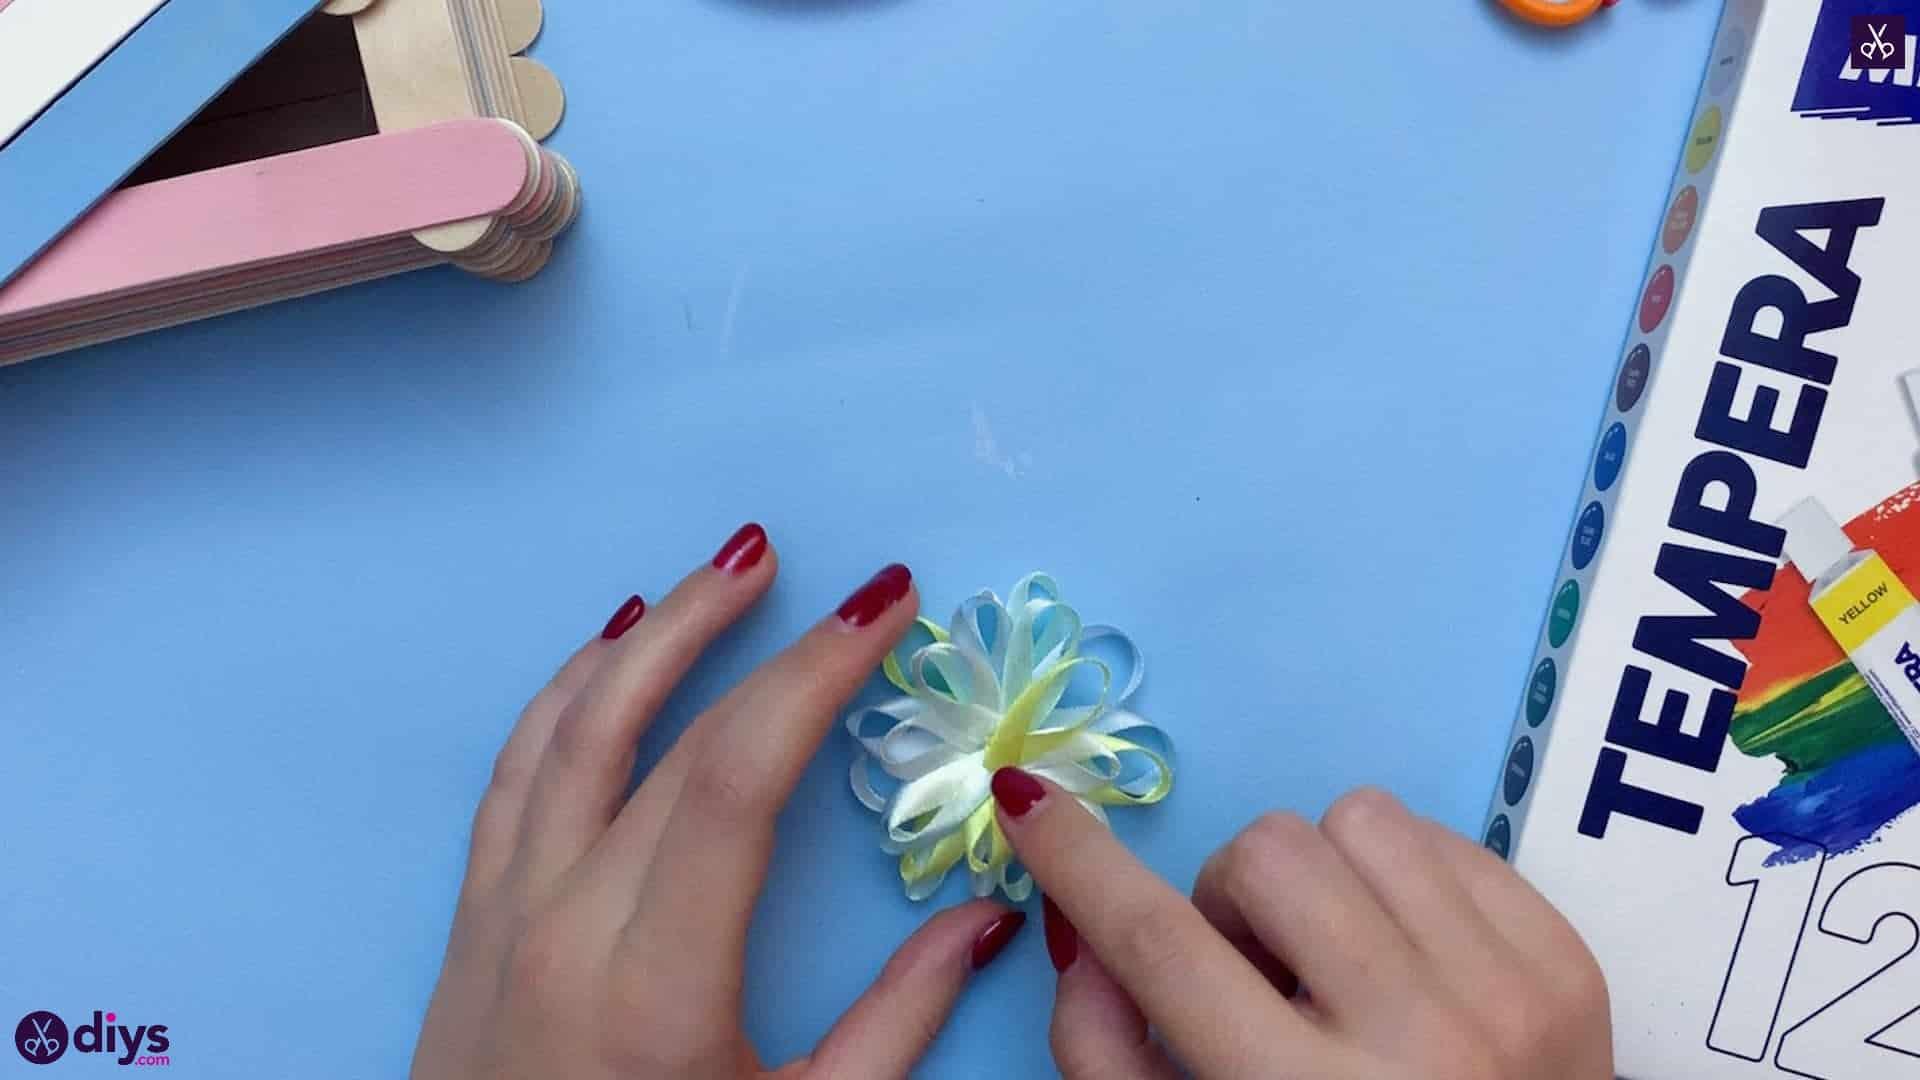 Diy popsicle stick jewelry box bow